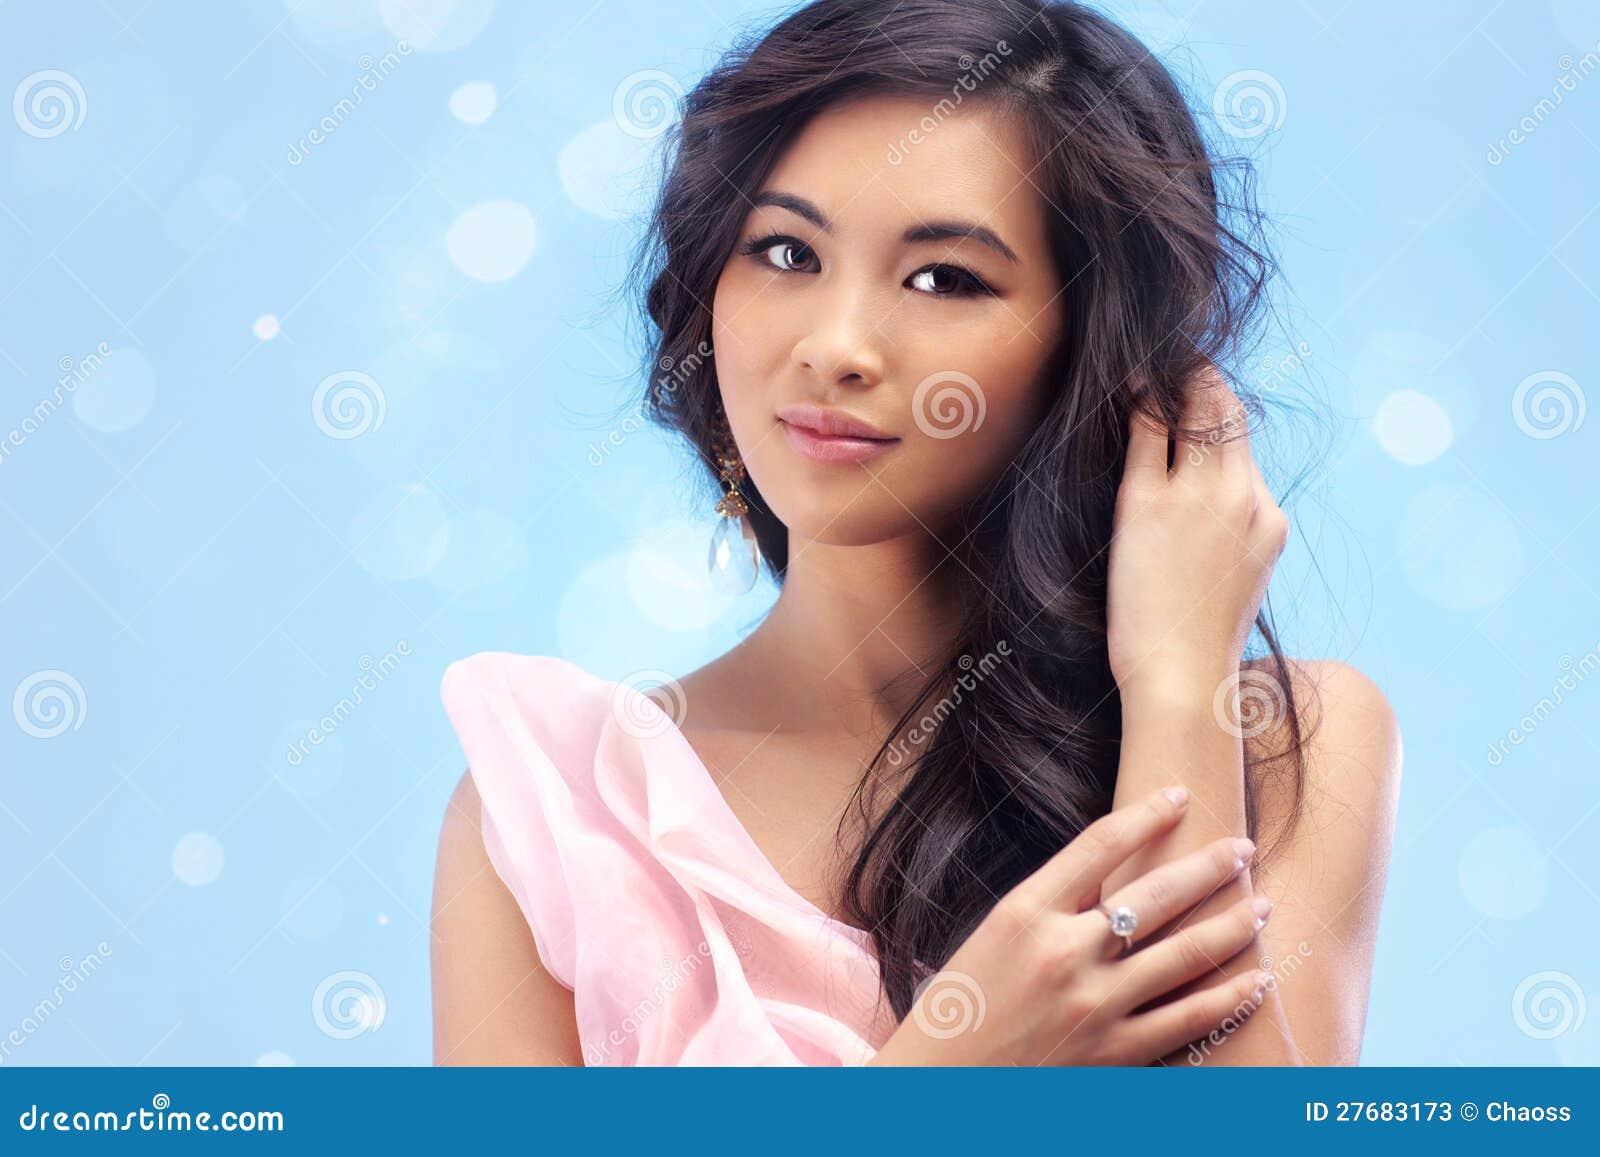 Фото девушки вьетнамки 17 фотография